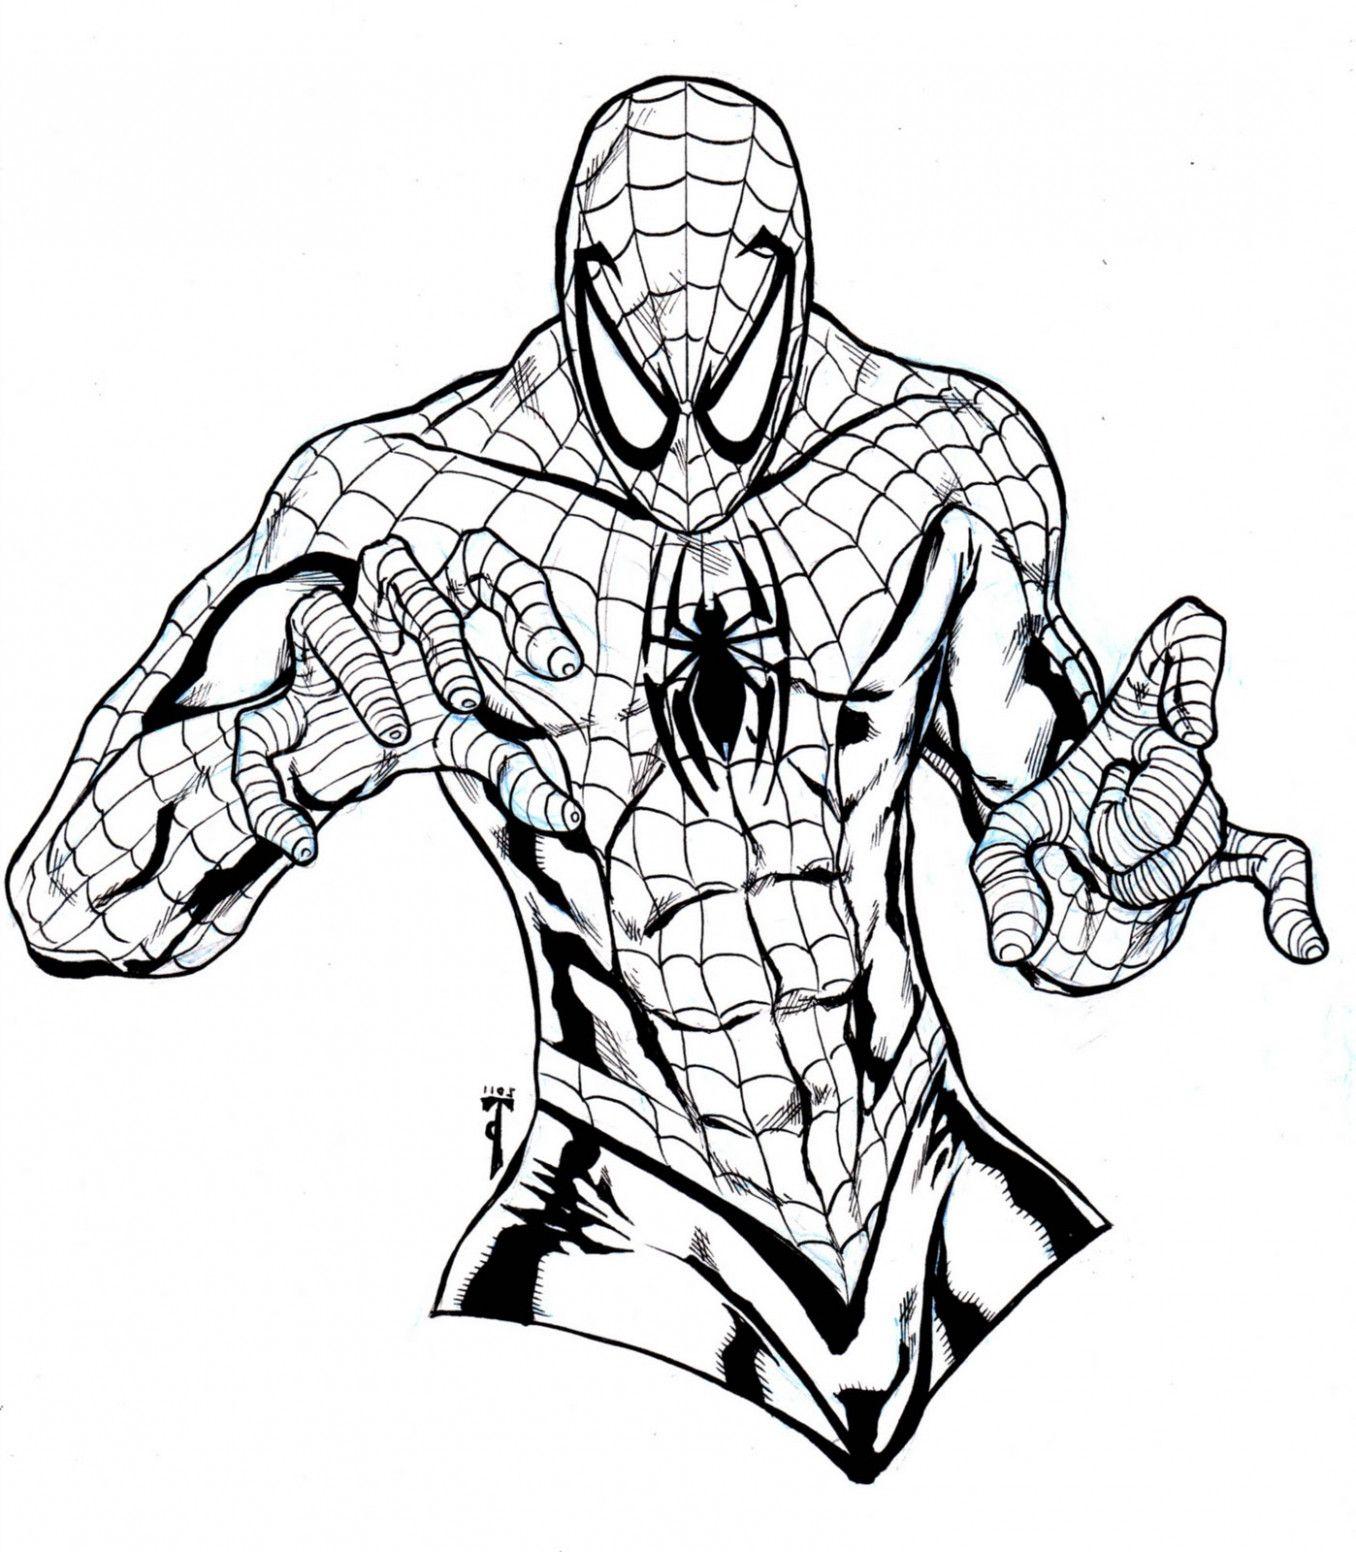 Top Seven Trends In Spiderman Coloring Pictures To Print To Watch Coloring Spiderman Coloring Coloring Pictures Print Pictures